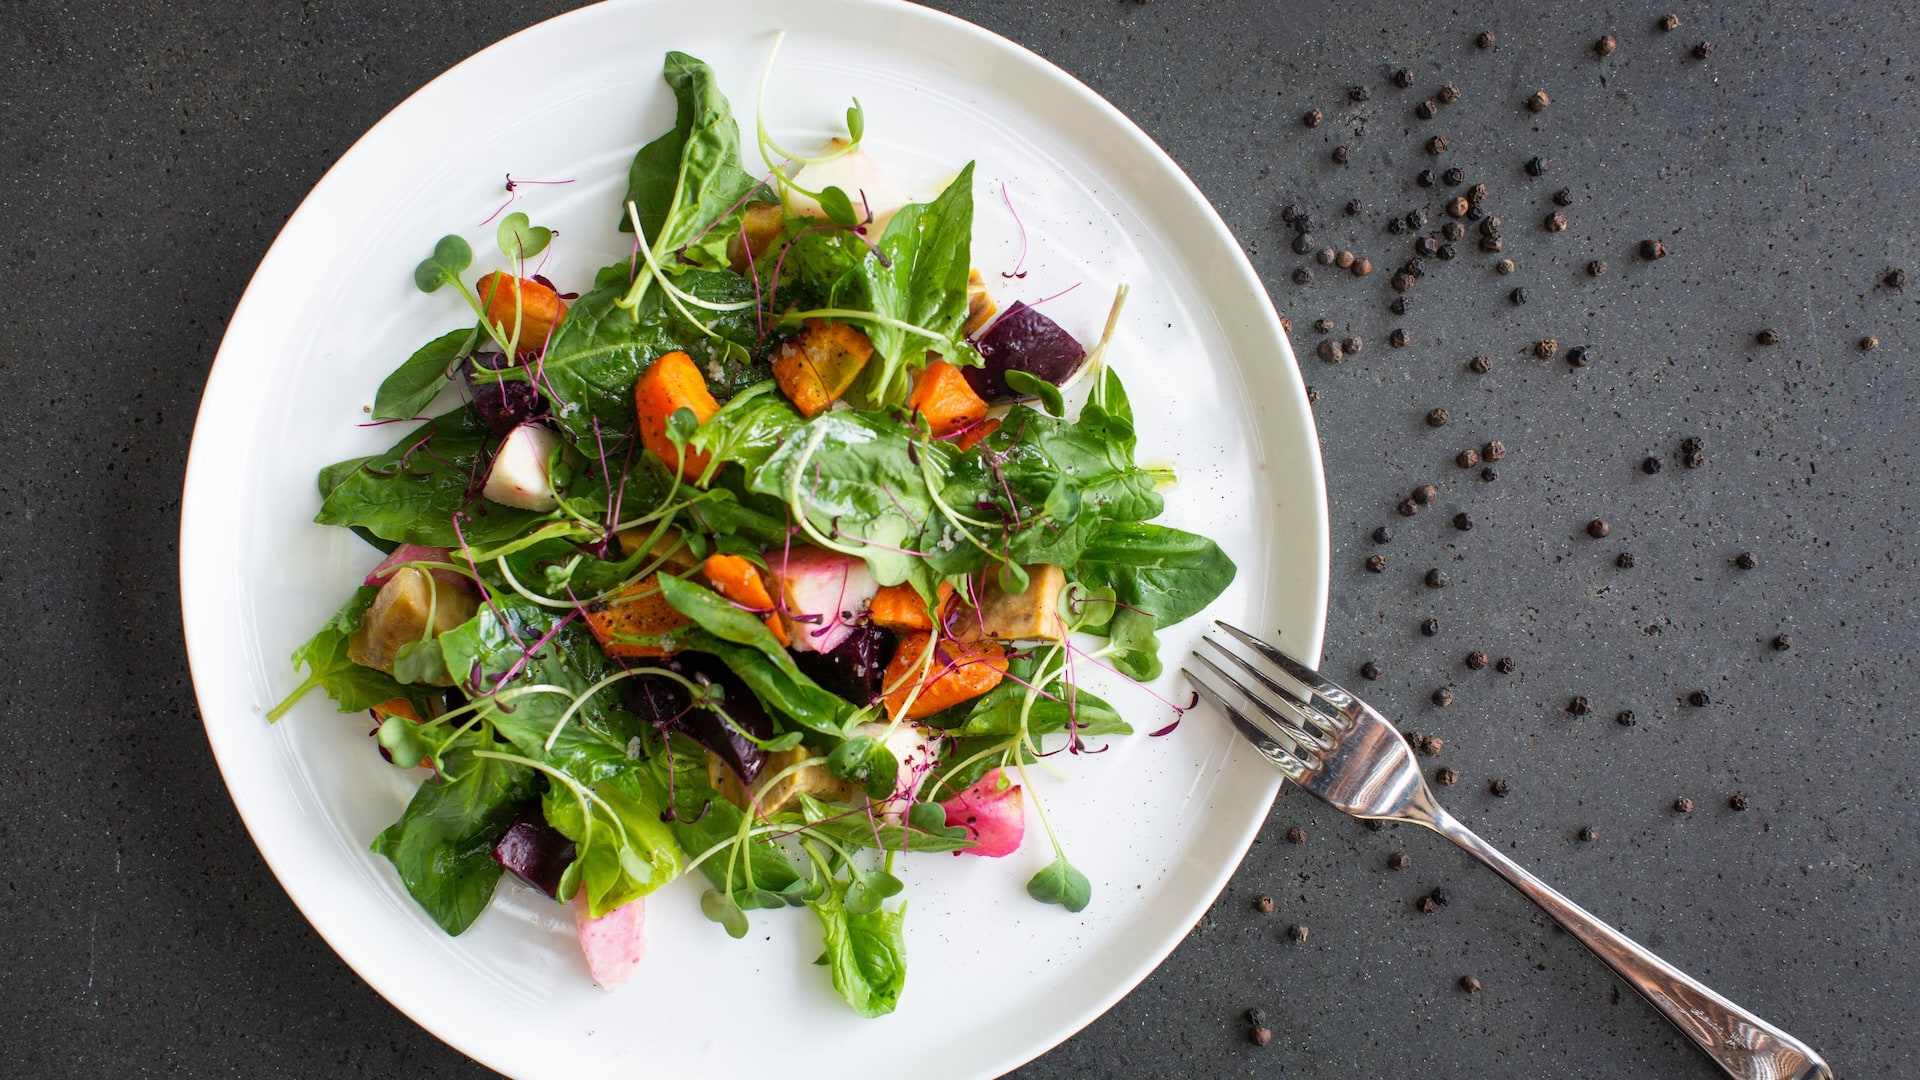 Salad With Utensils